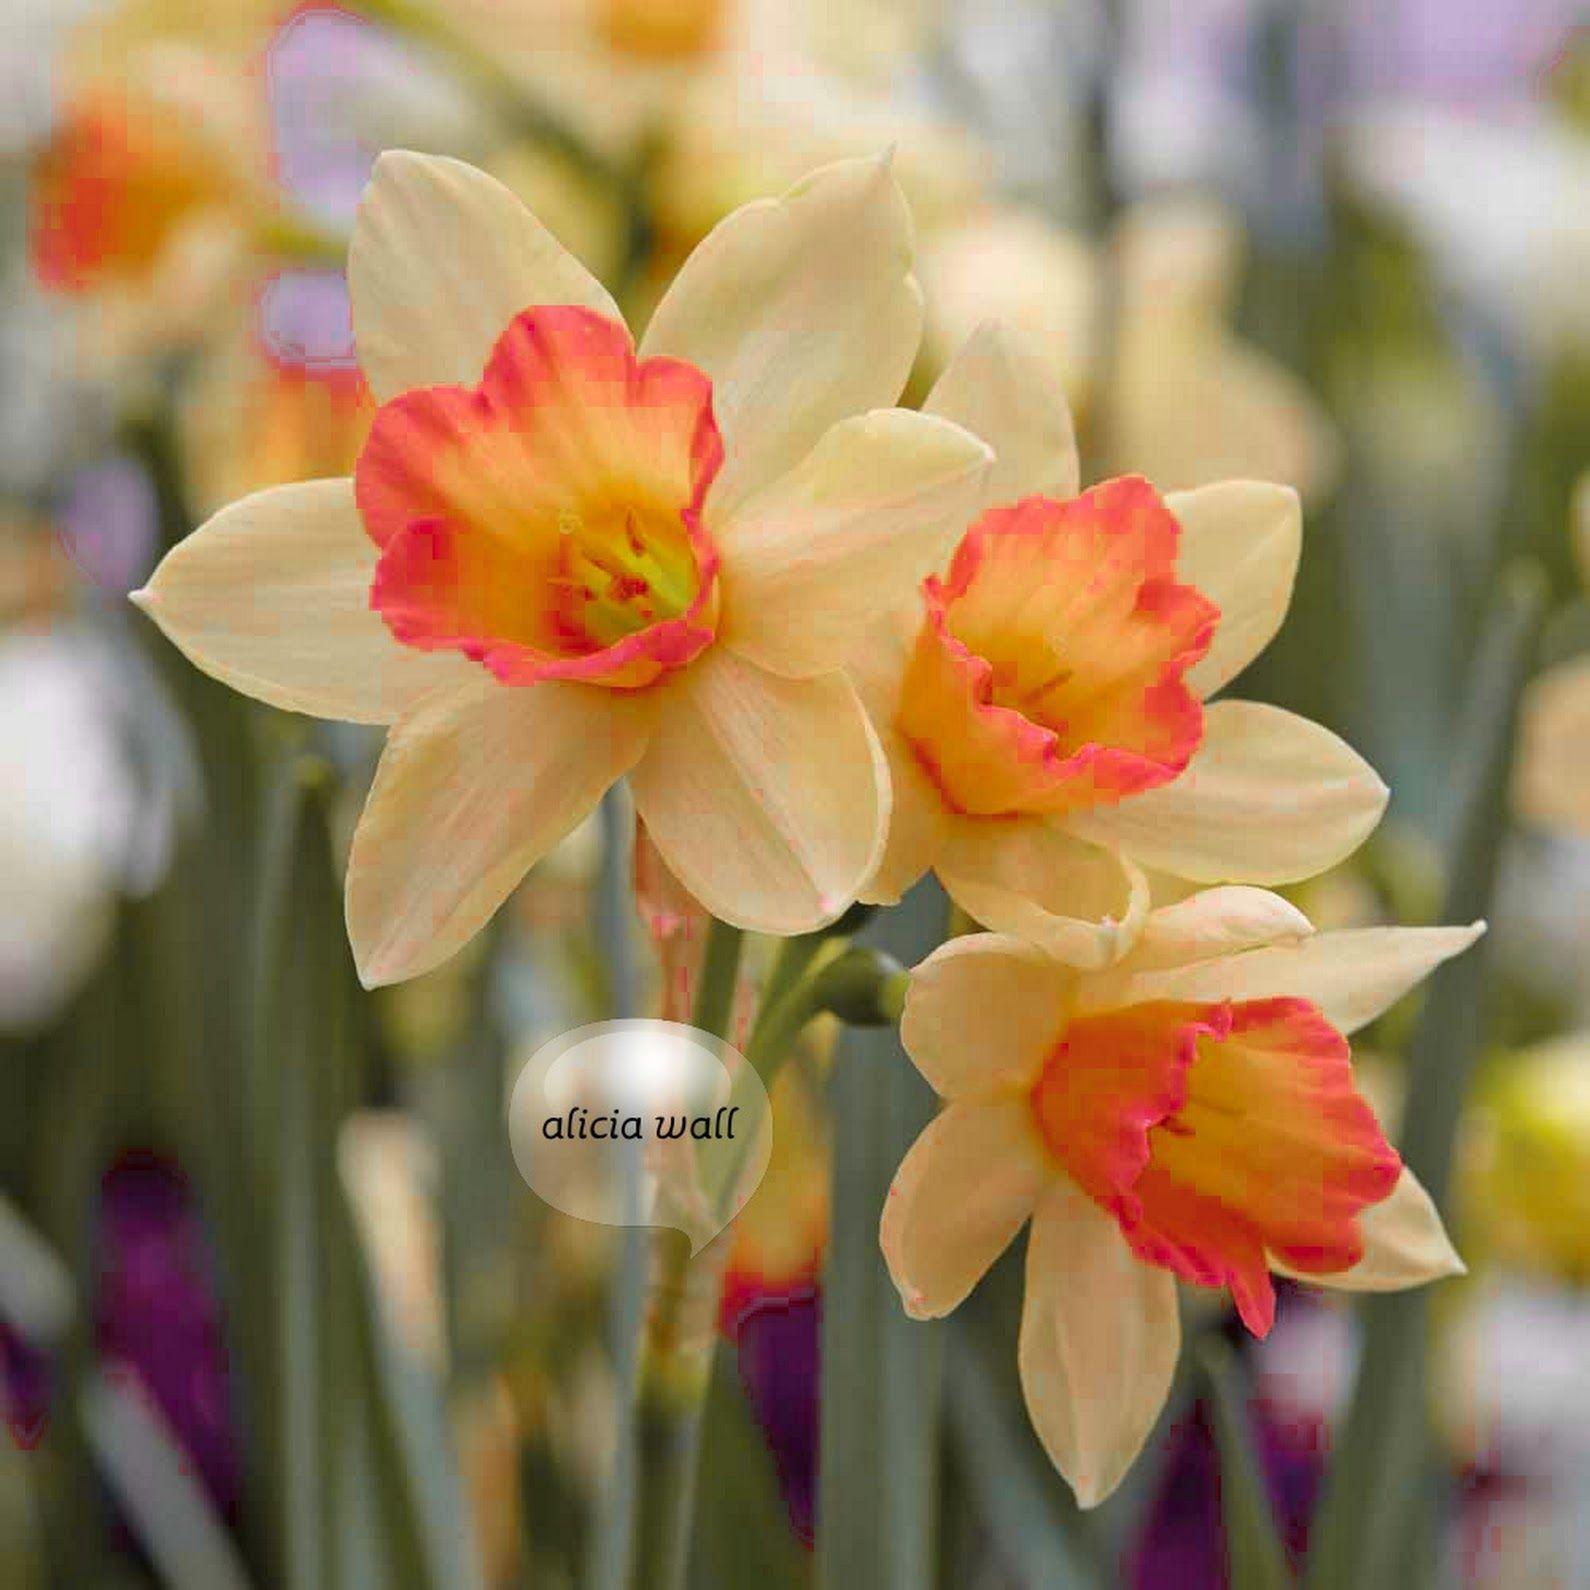 Pin By Grace R On Flowers Daffodil Bulbs Narcissus Flower Daffodil Flower